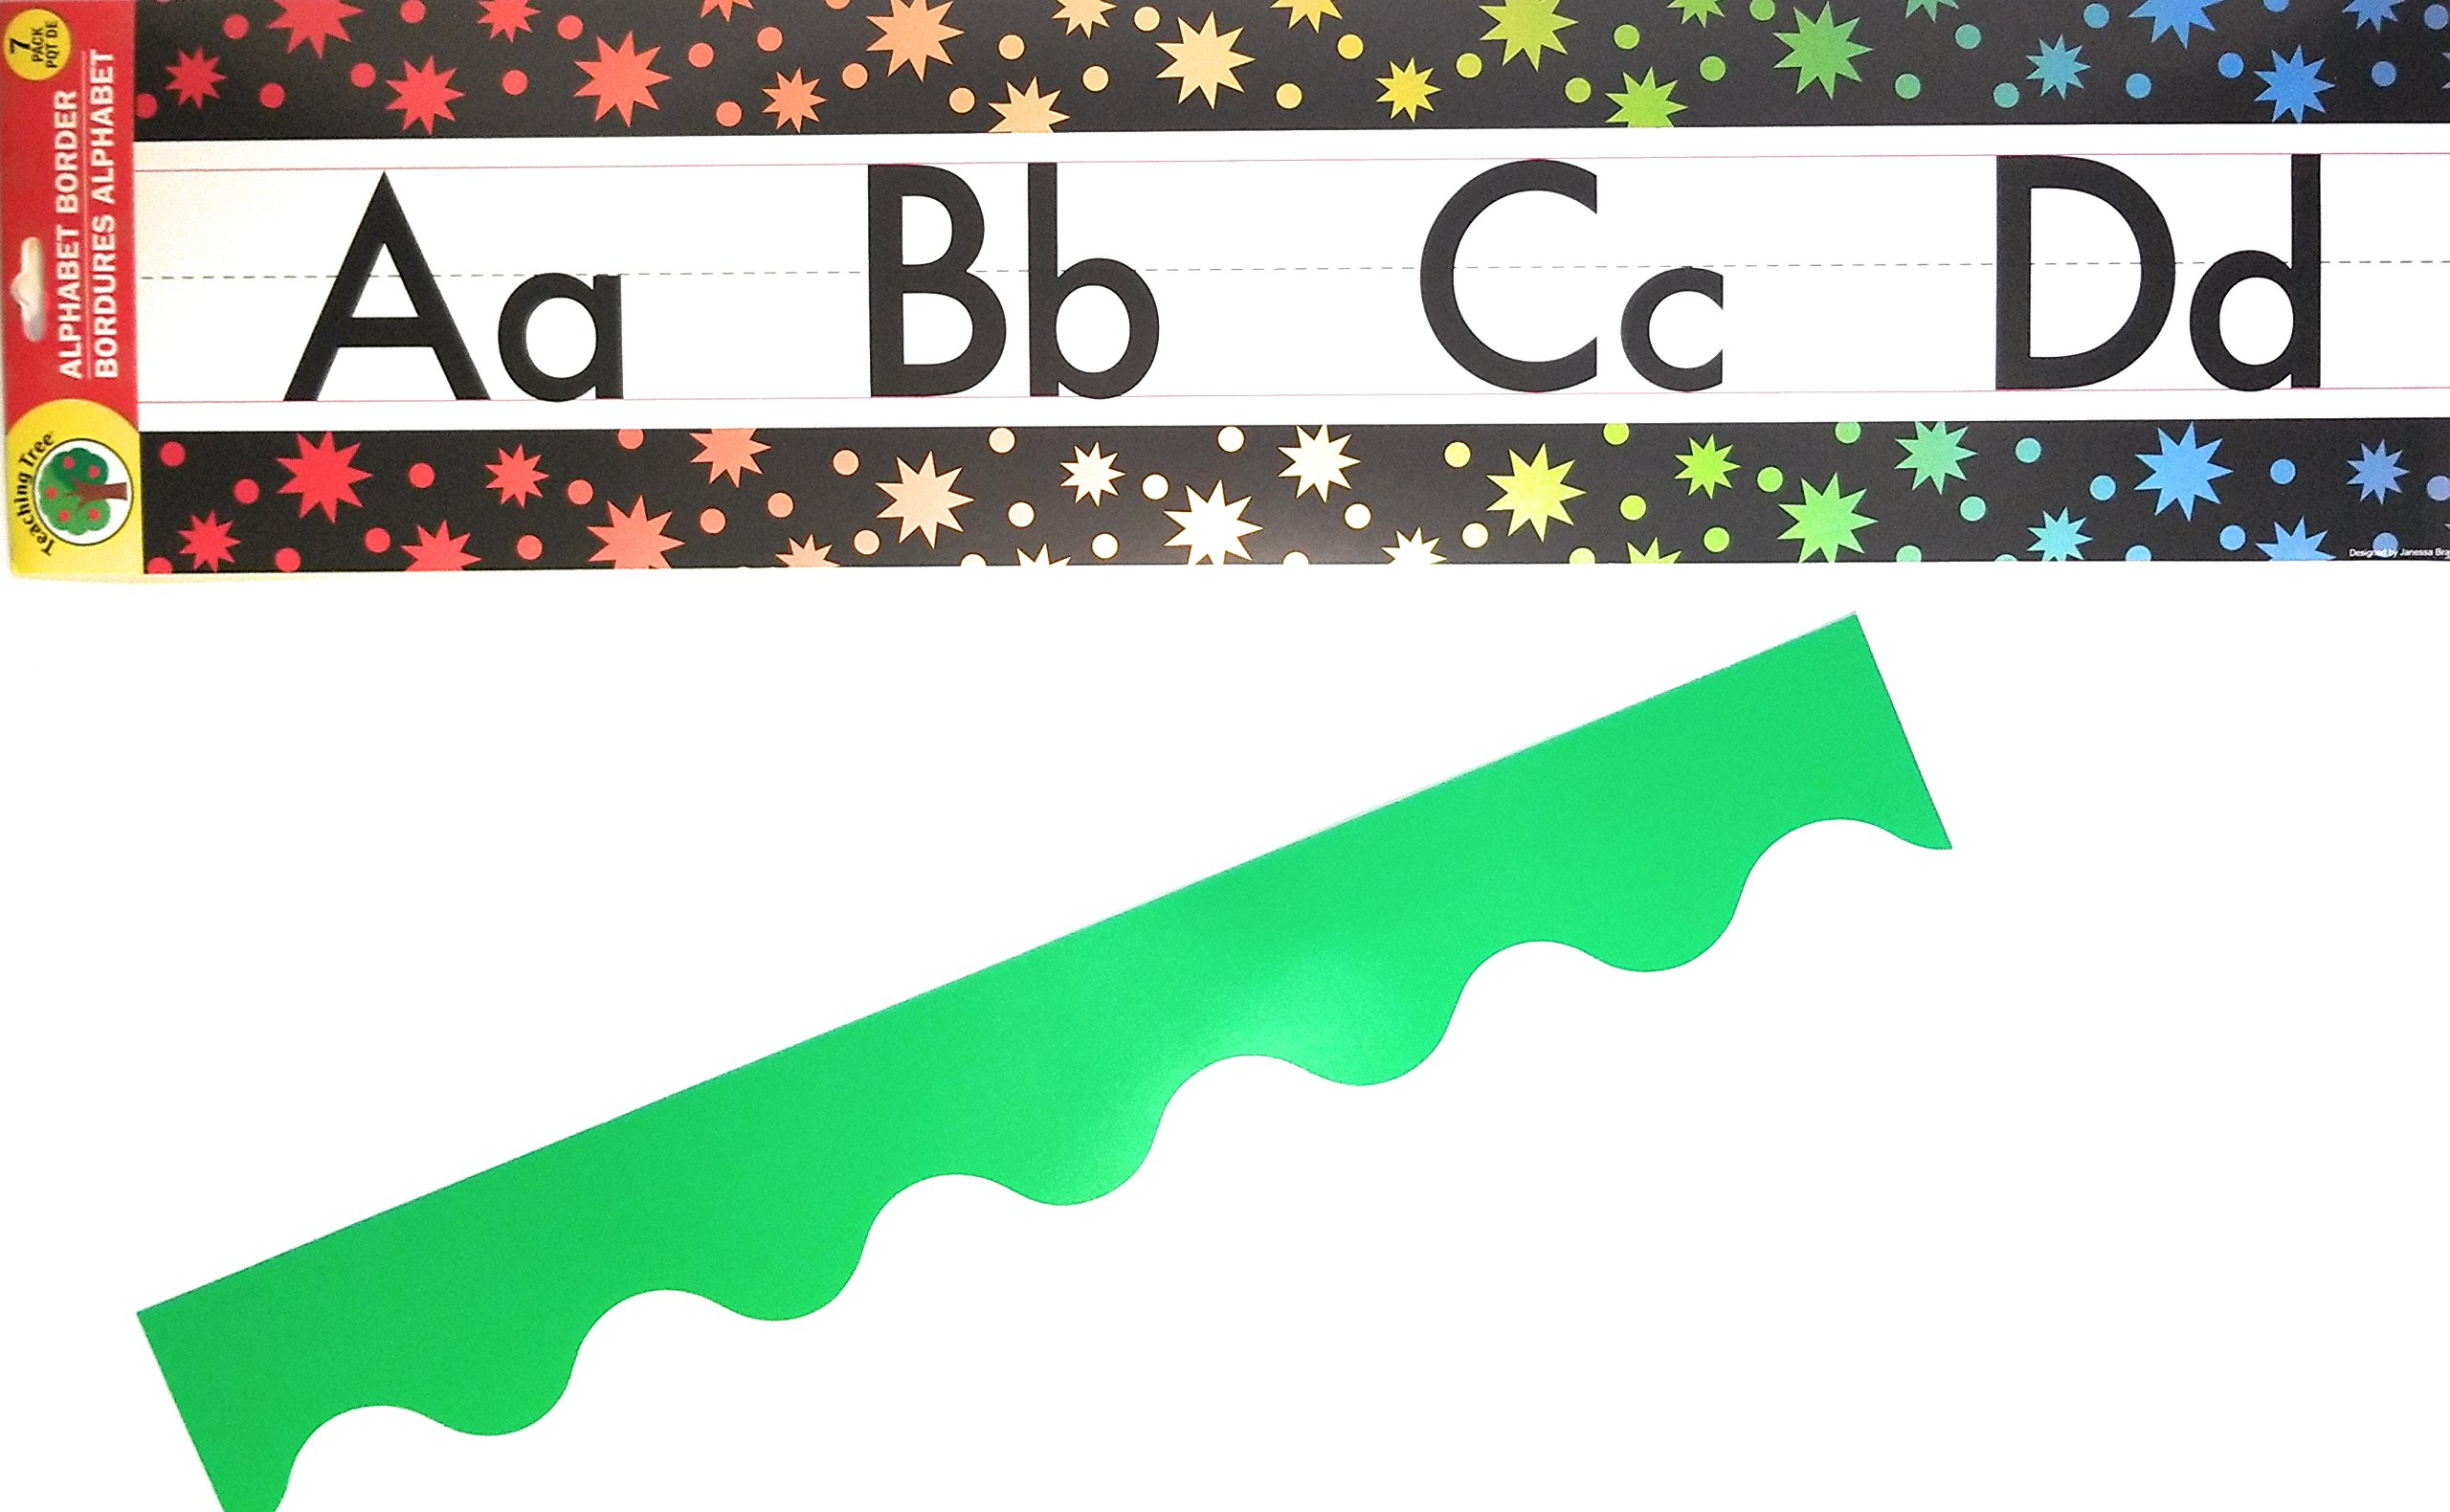 Amazon Com Alphabet Bulletin Board Border Set Multi Color Classroom Decorations Preschool Kindergarten Elementary Creative Strips School Supplies Bulletin Trim Wall Border Wall Decal Classroom Decor Home Improvement